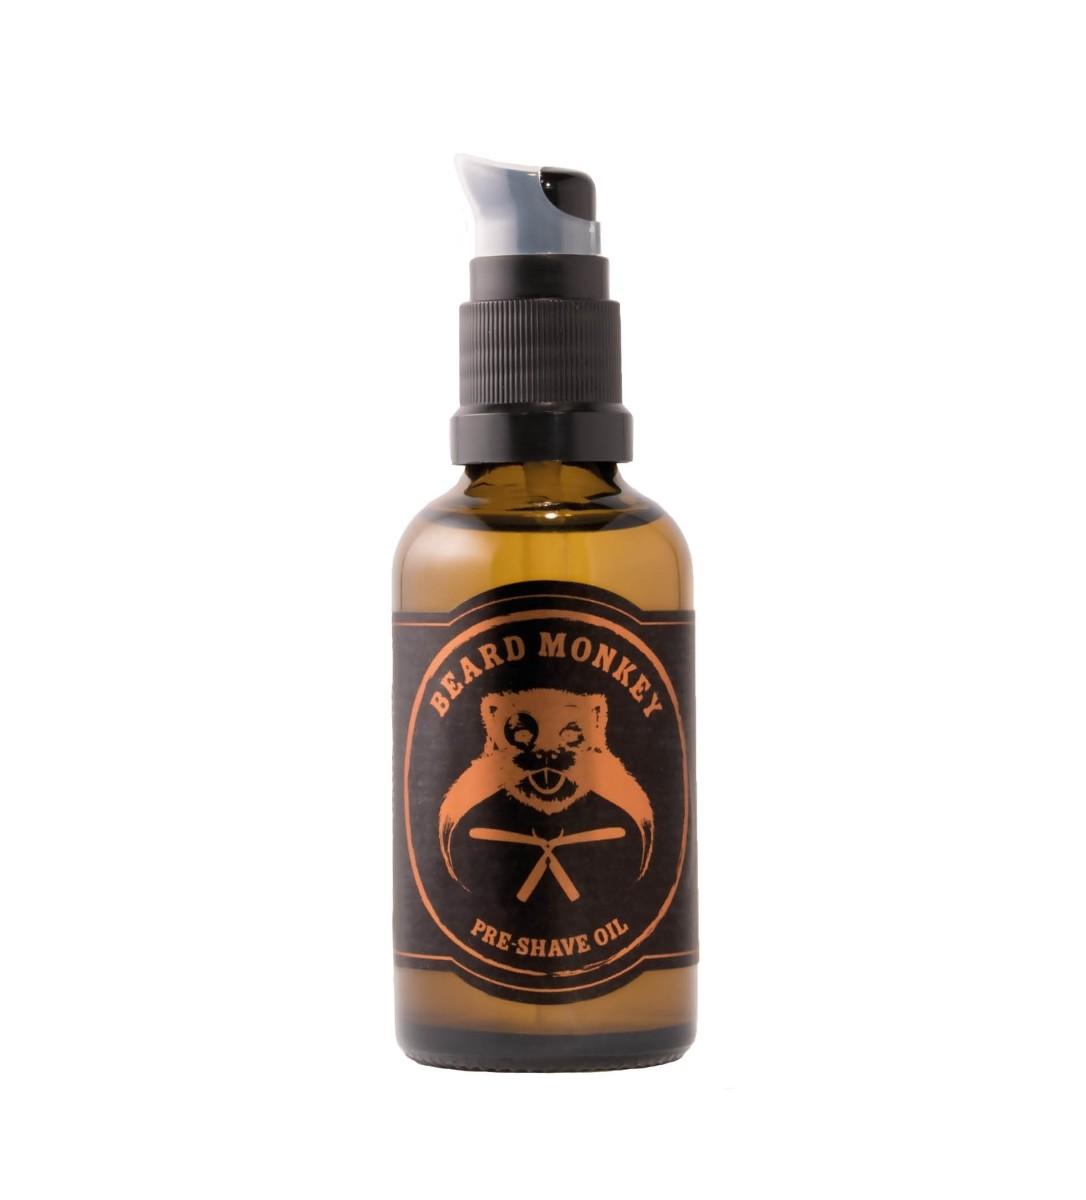 Beard Monkey Pre-Shave Oil